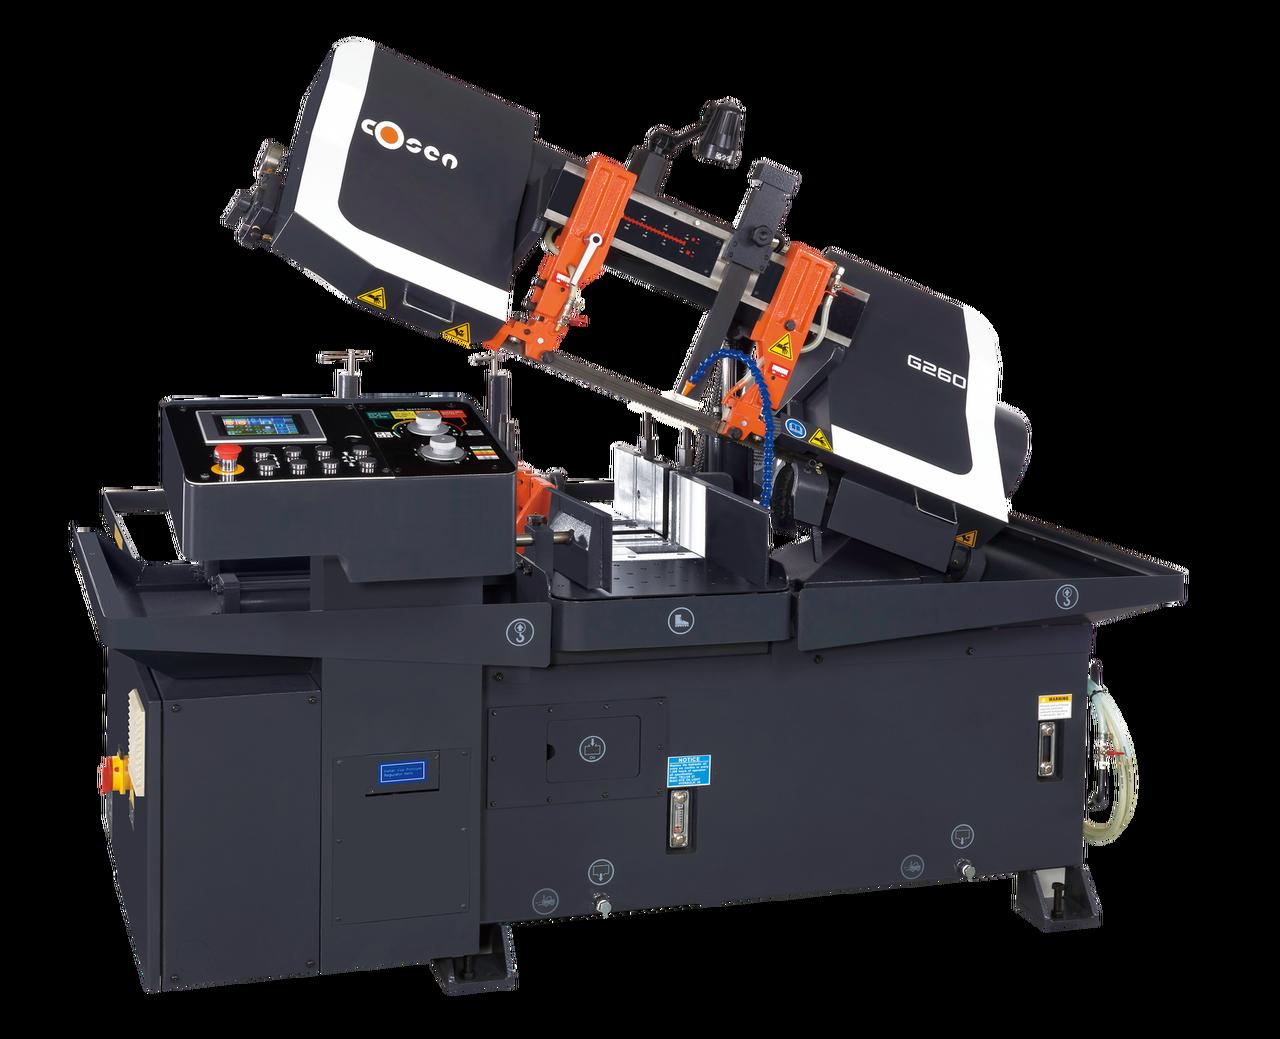 G260 Automatic Bandsaw Machine